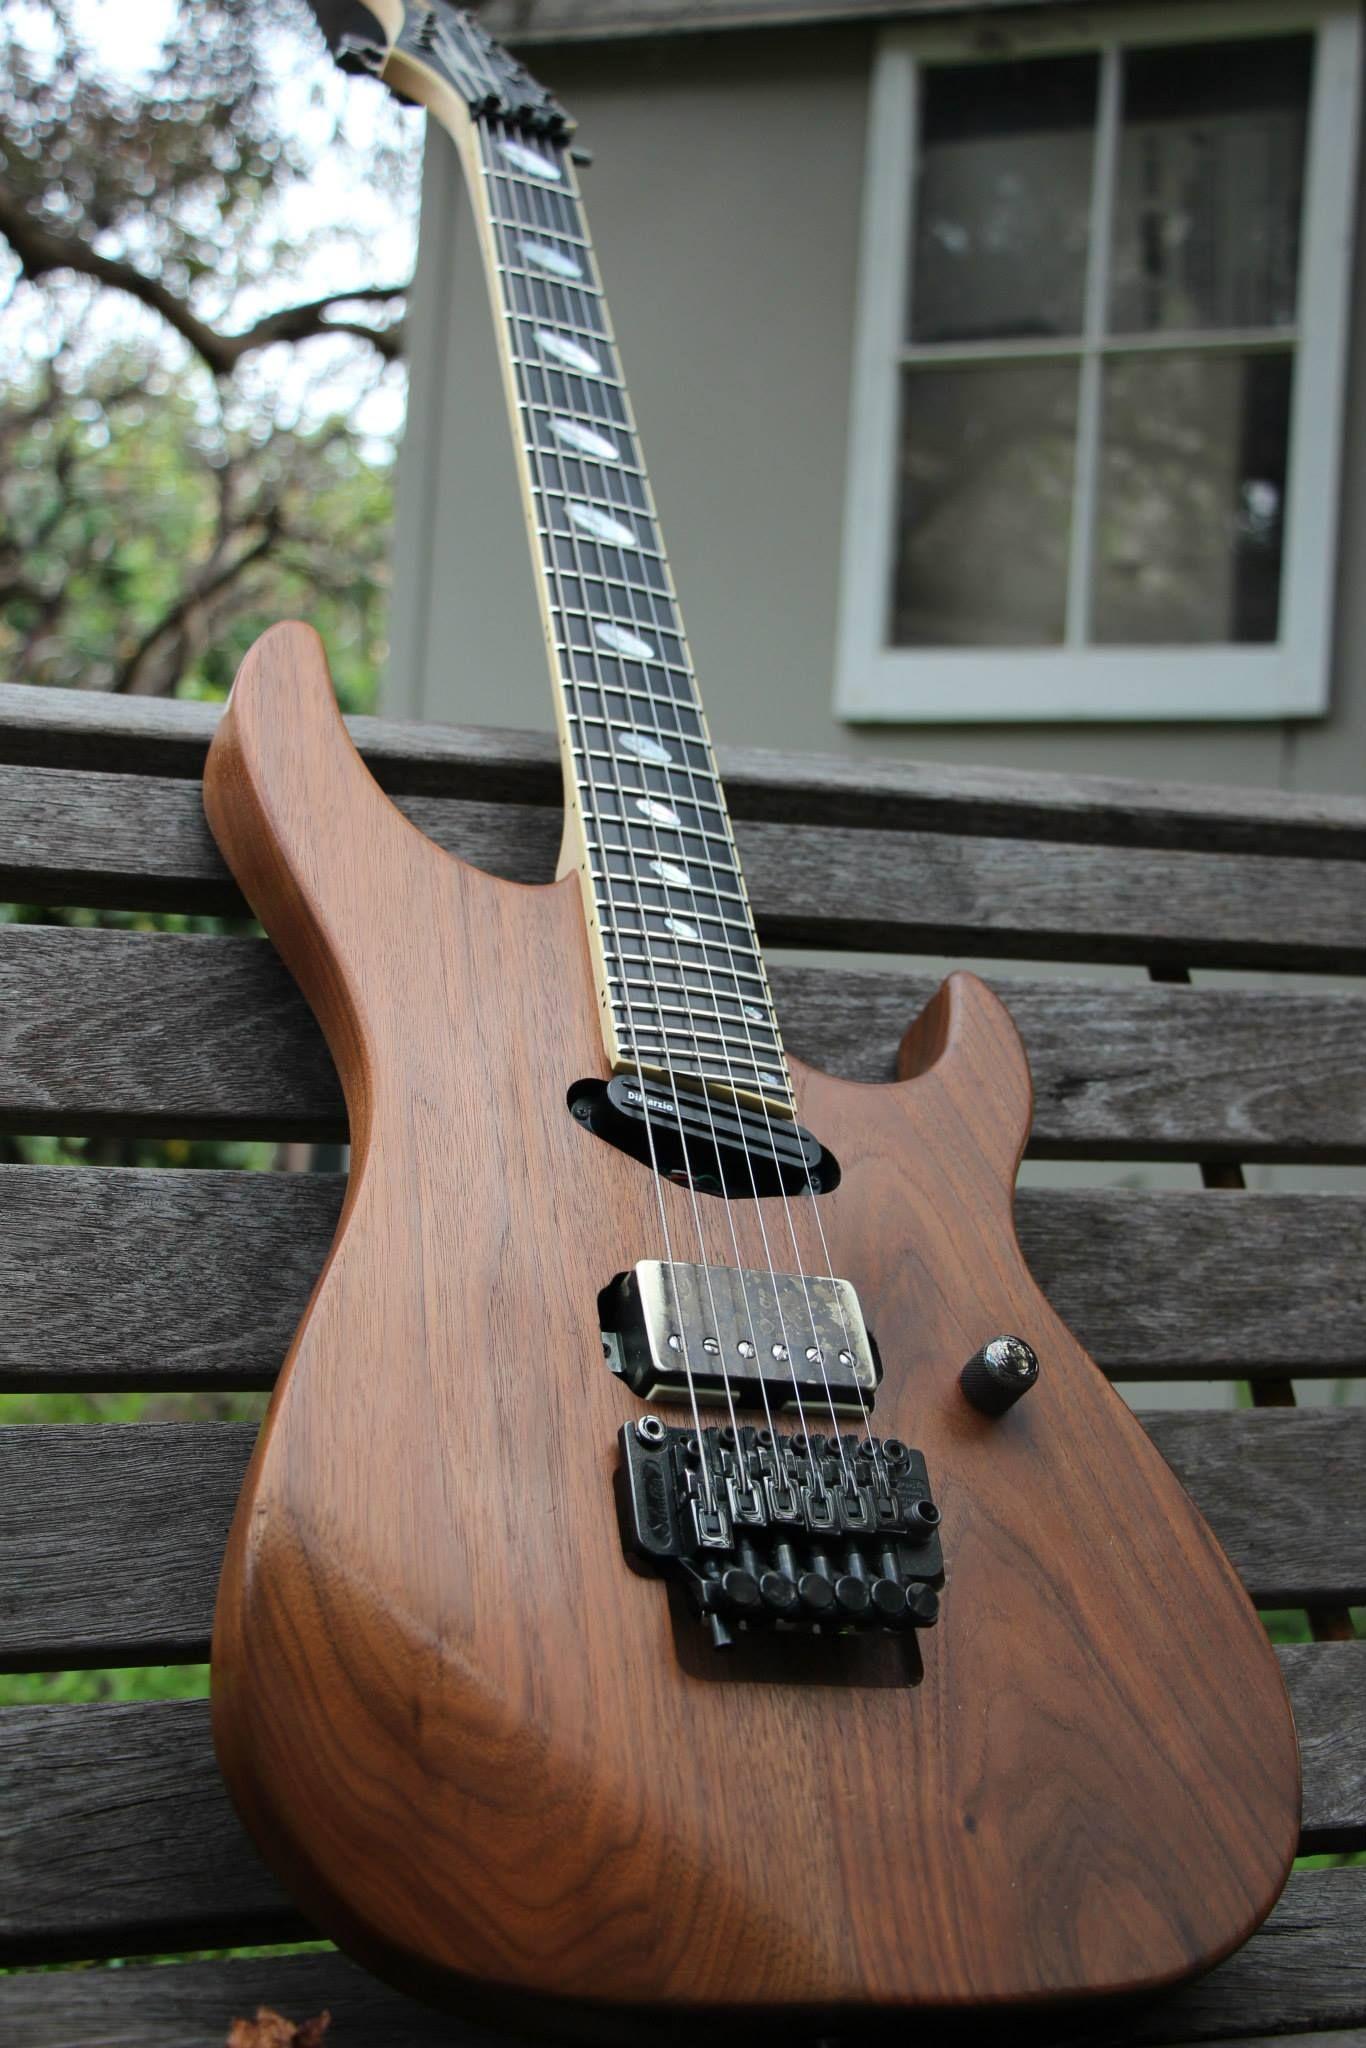 caparison horus hgs oiled walnut guitars guitar string quartet music instruments. Black Bedroom Furniture Sets. Home Design Ideas